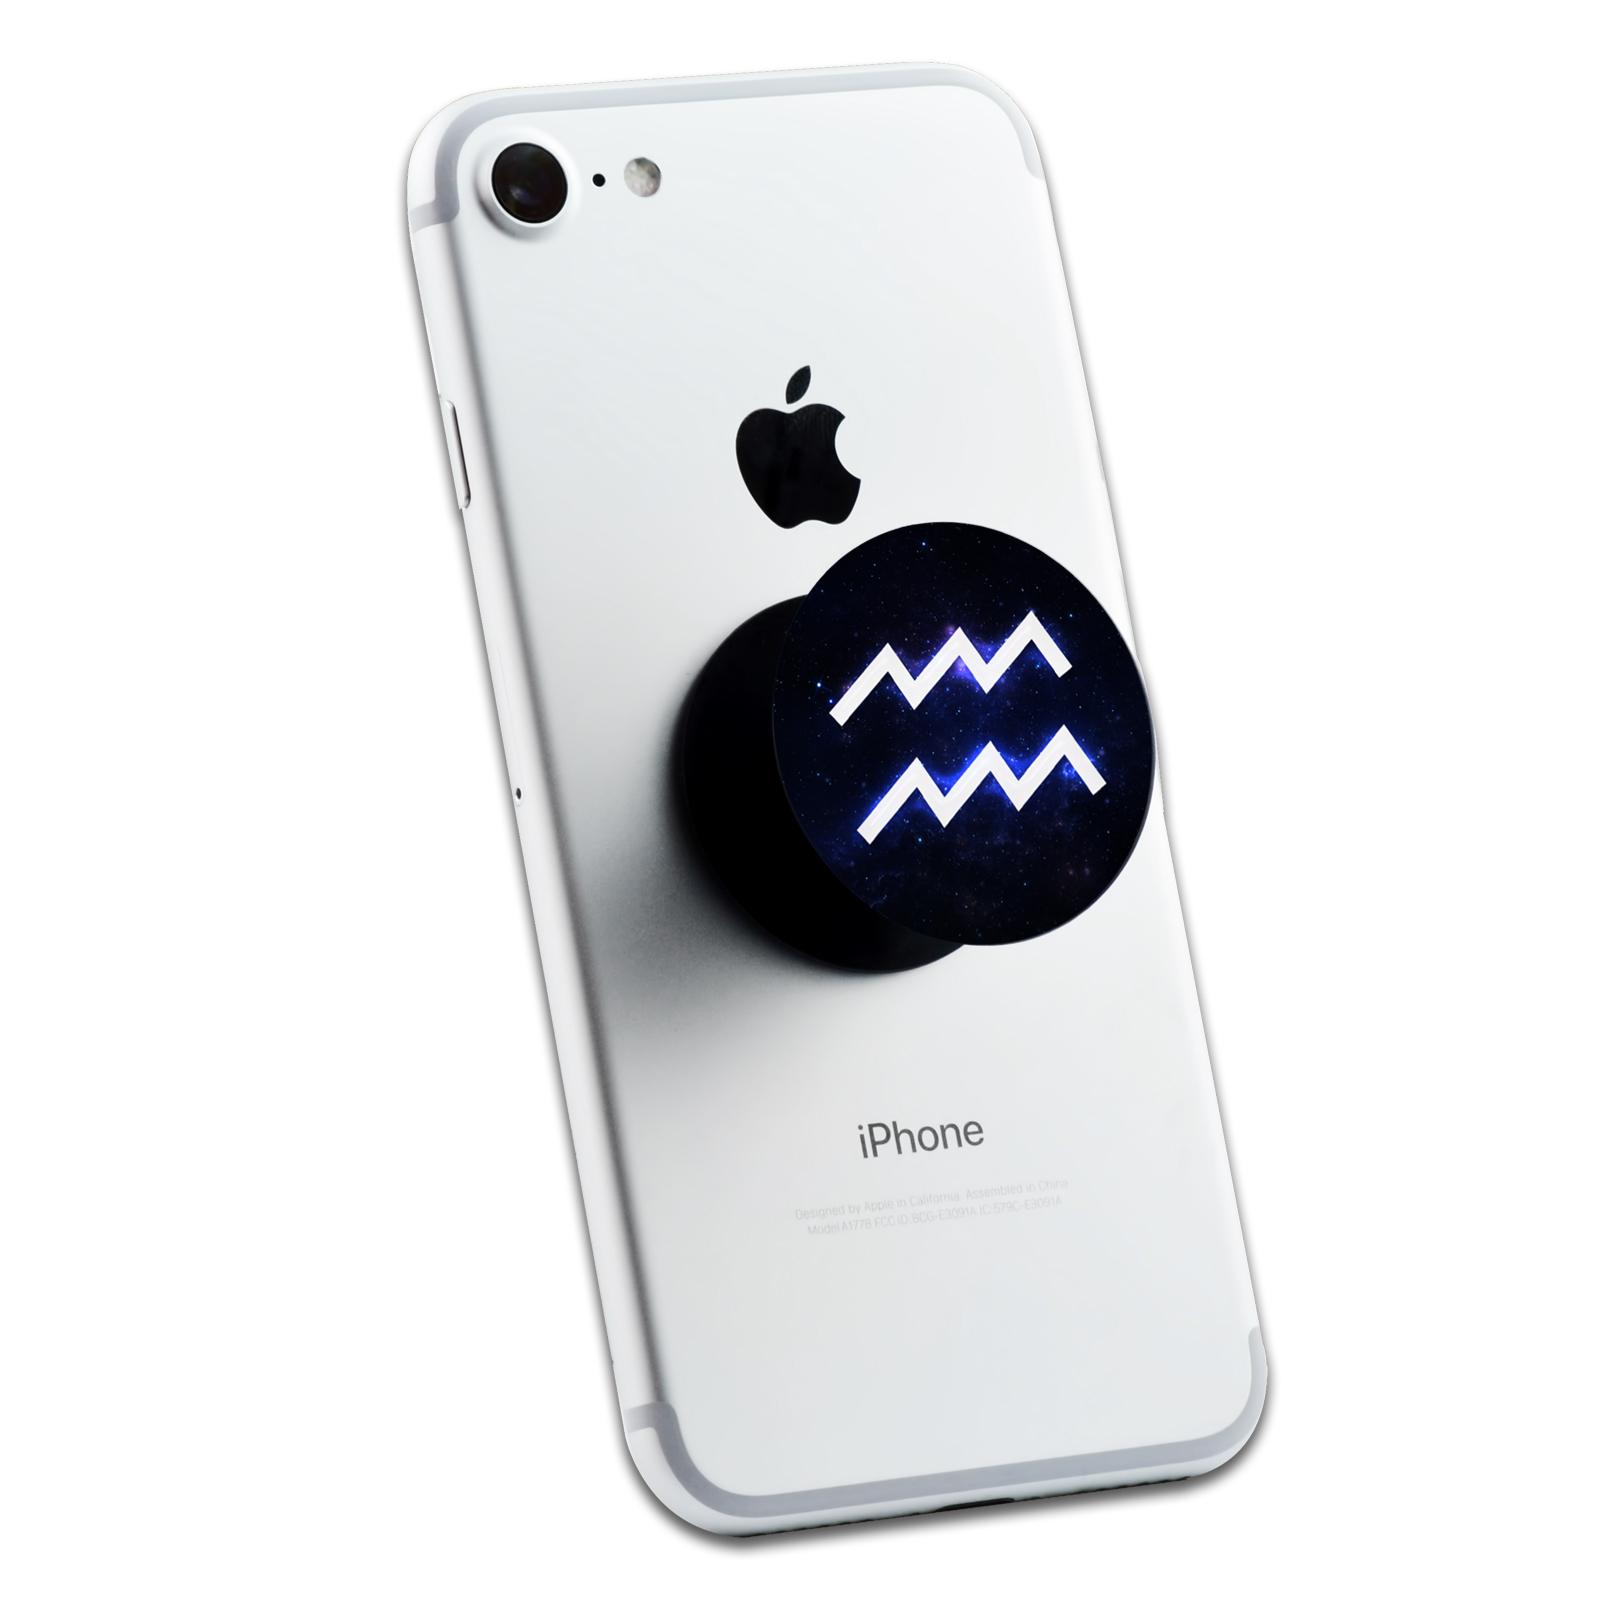 Aquarius Galaxy Zodiac Symbol 2 Sticker Set For Pop Grip Stent For